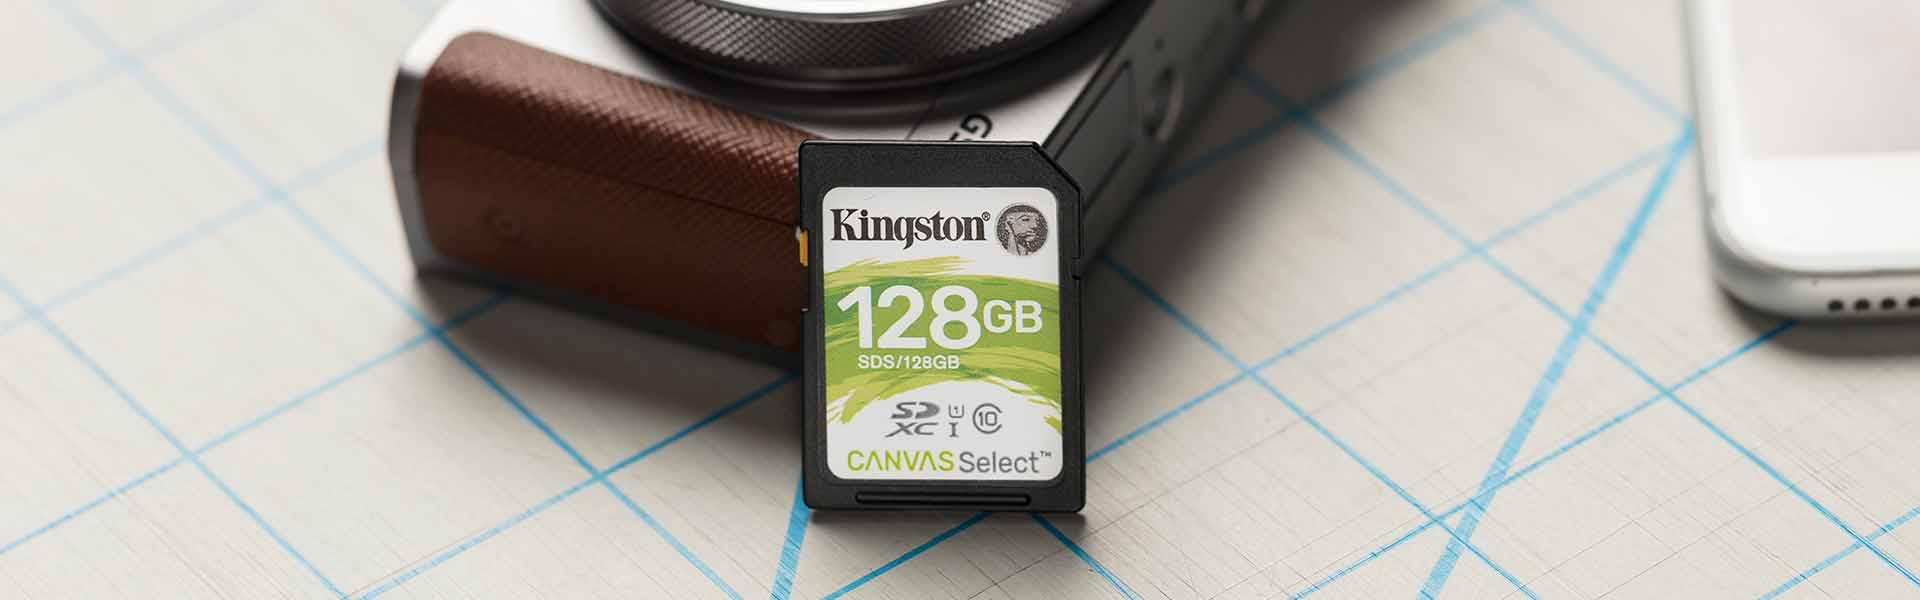 Kingston SD Memory Cards